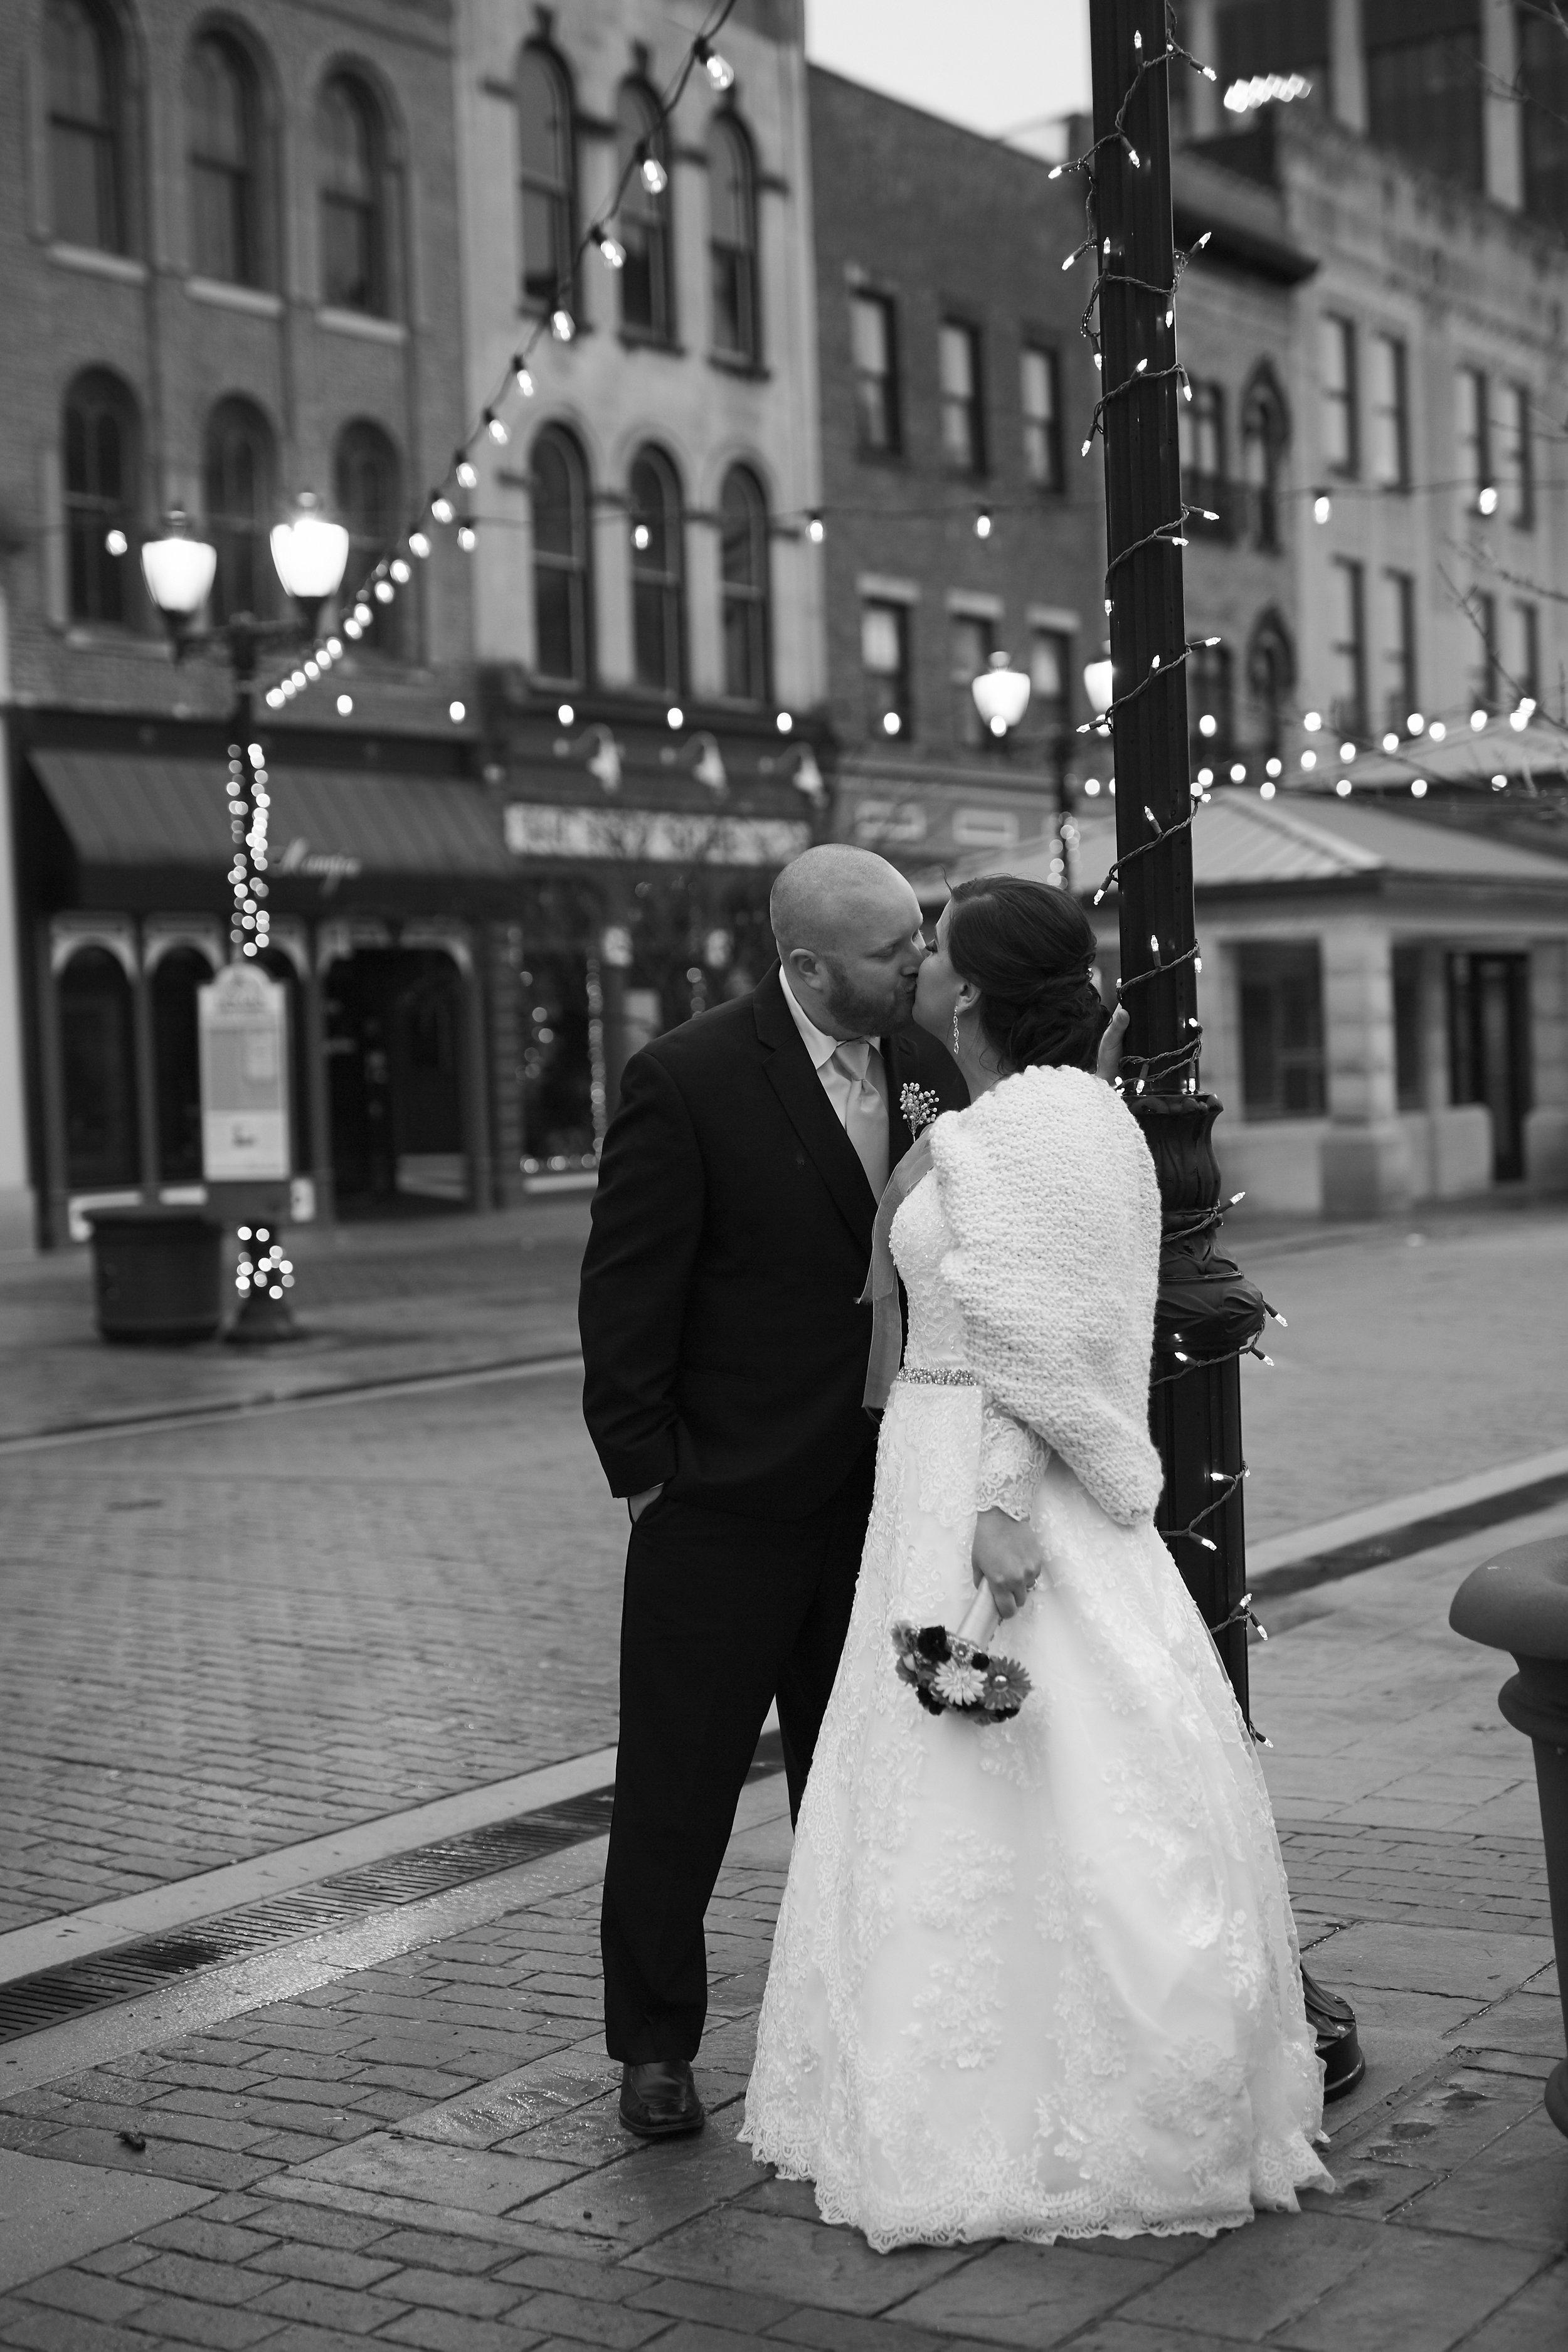 Liz & Josh Wedding -  benromangphoto - 6I5A0757.jpg